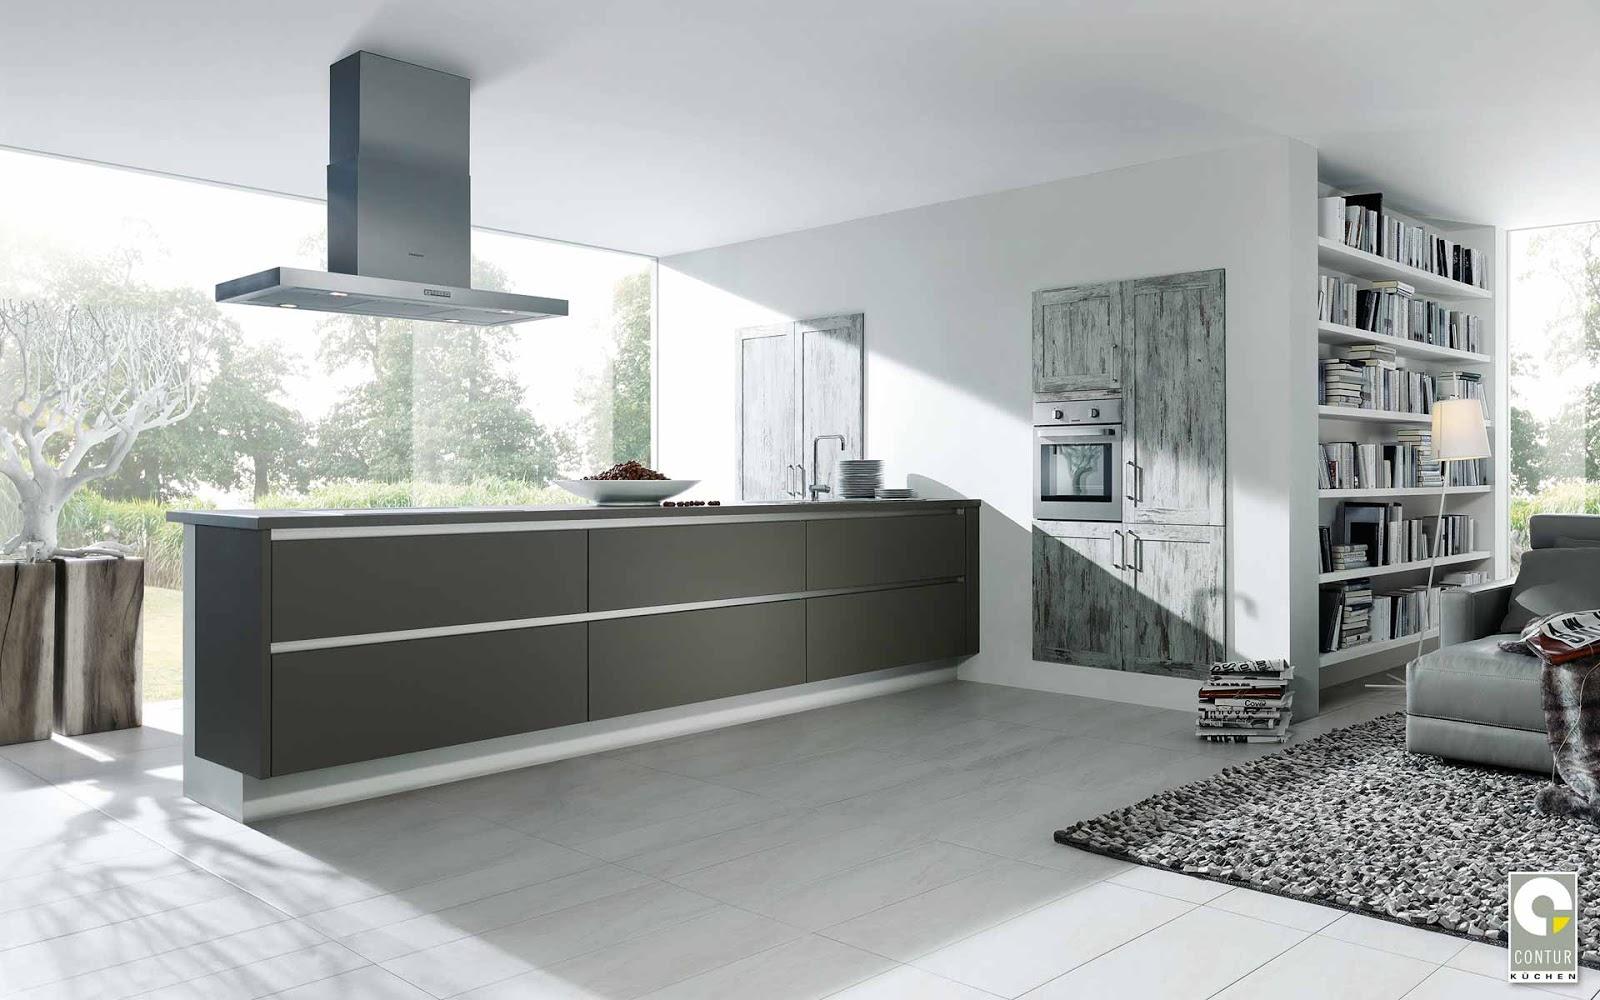 küchen aktuell wuppertal verkaufsoffener sonntag  Home Design